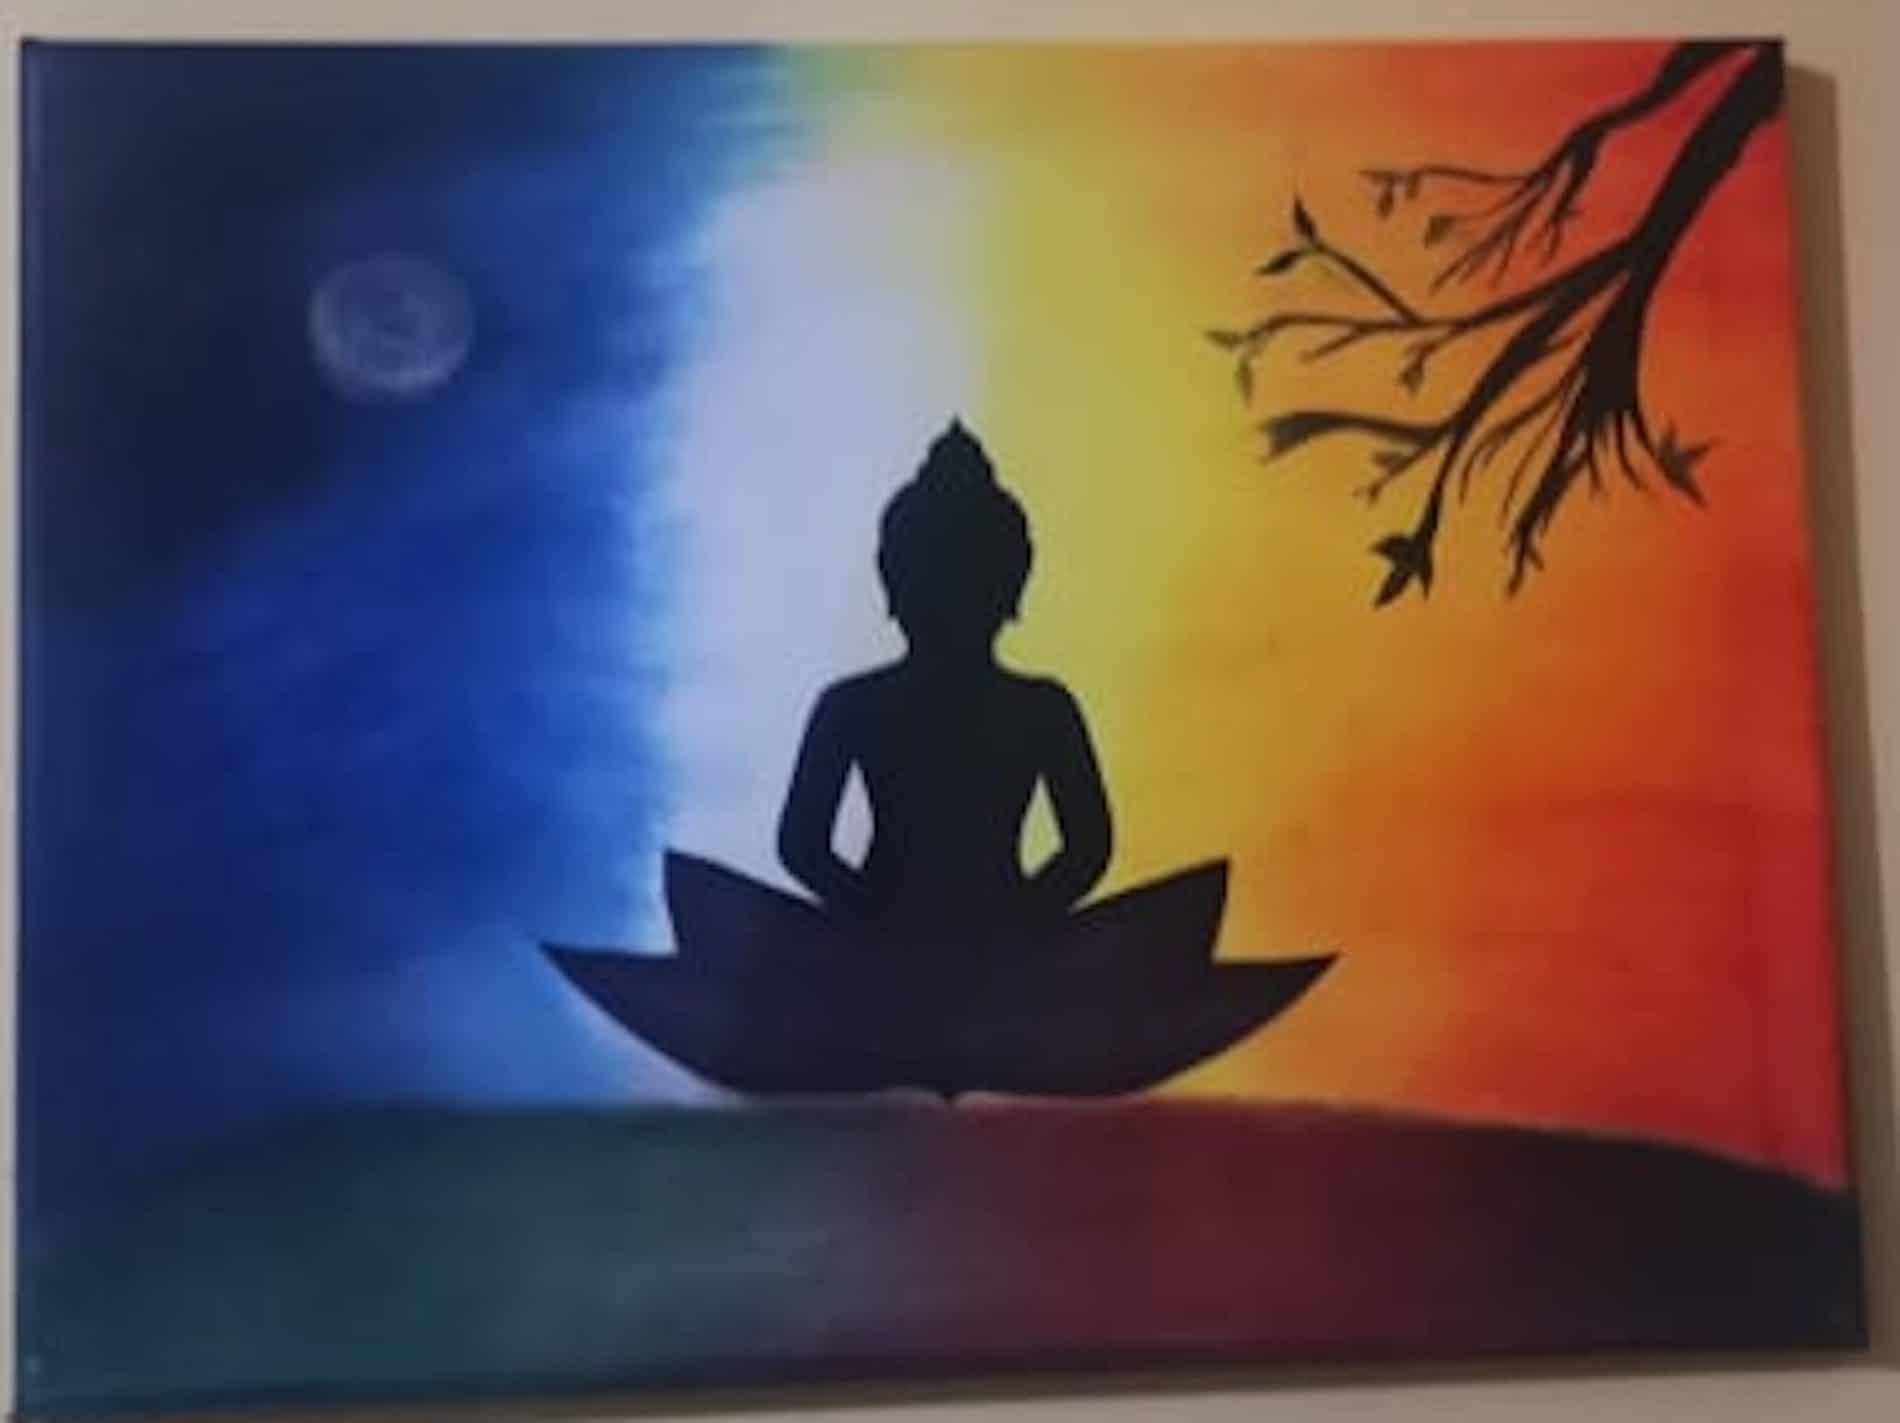 mauritius-arts-anoushka apadoo-inner-self-peace